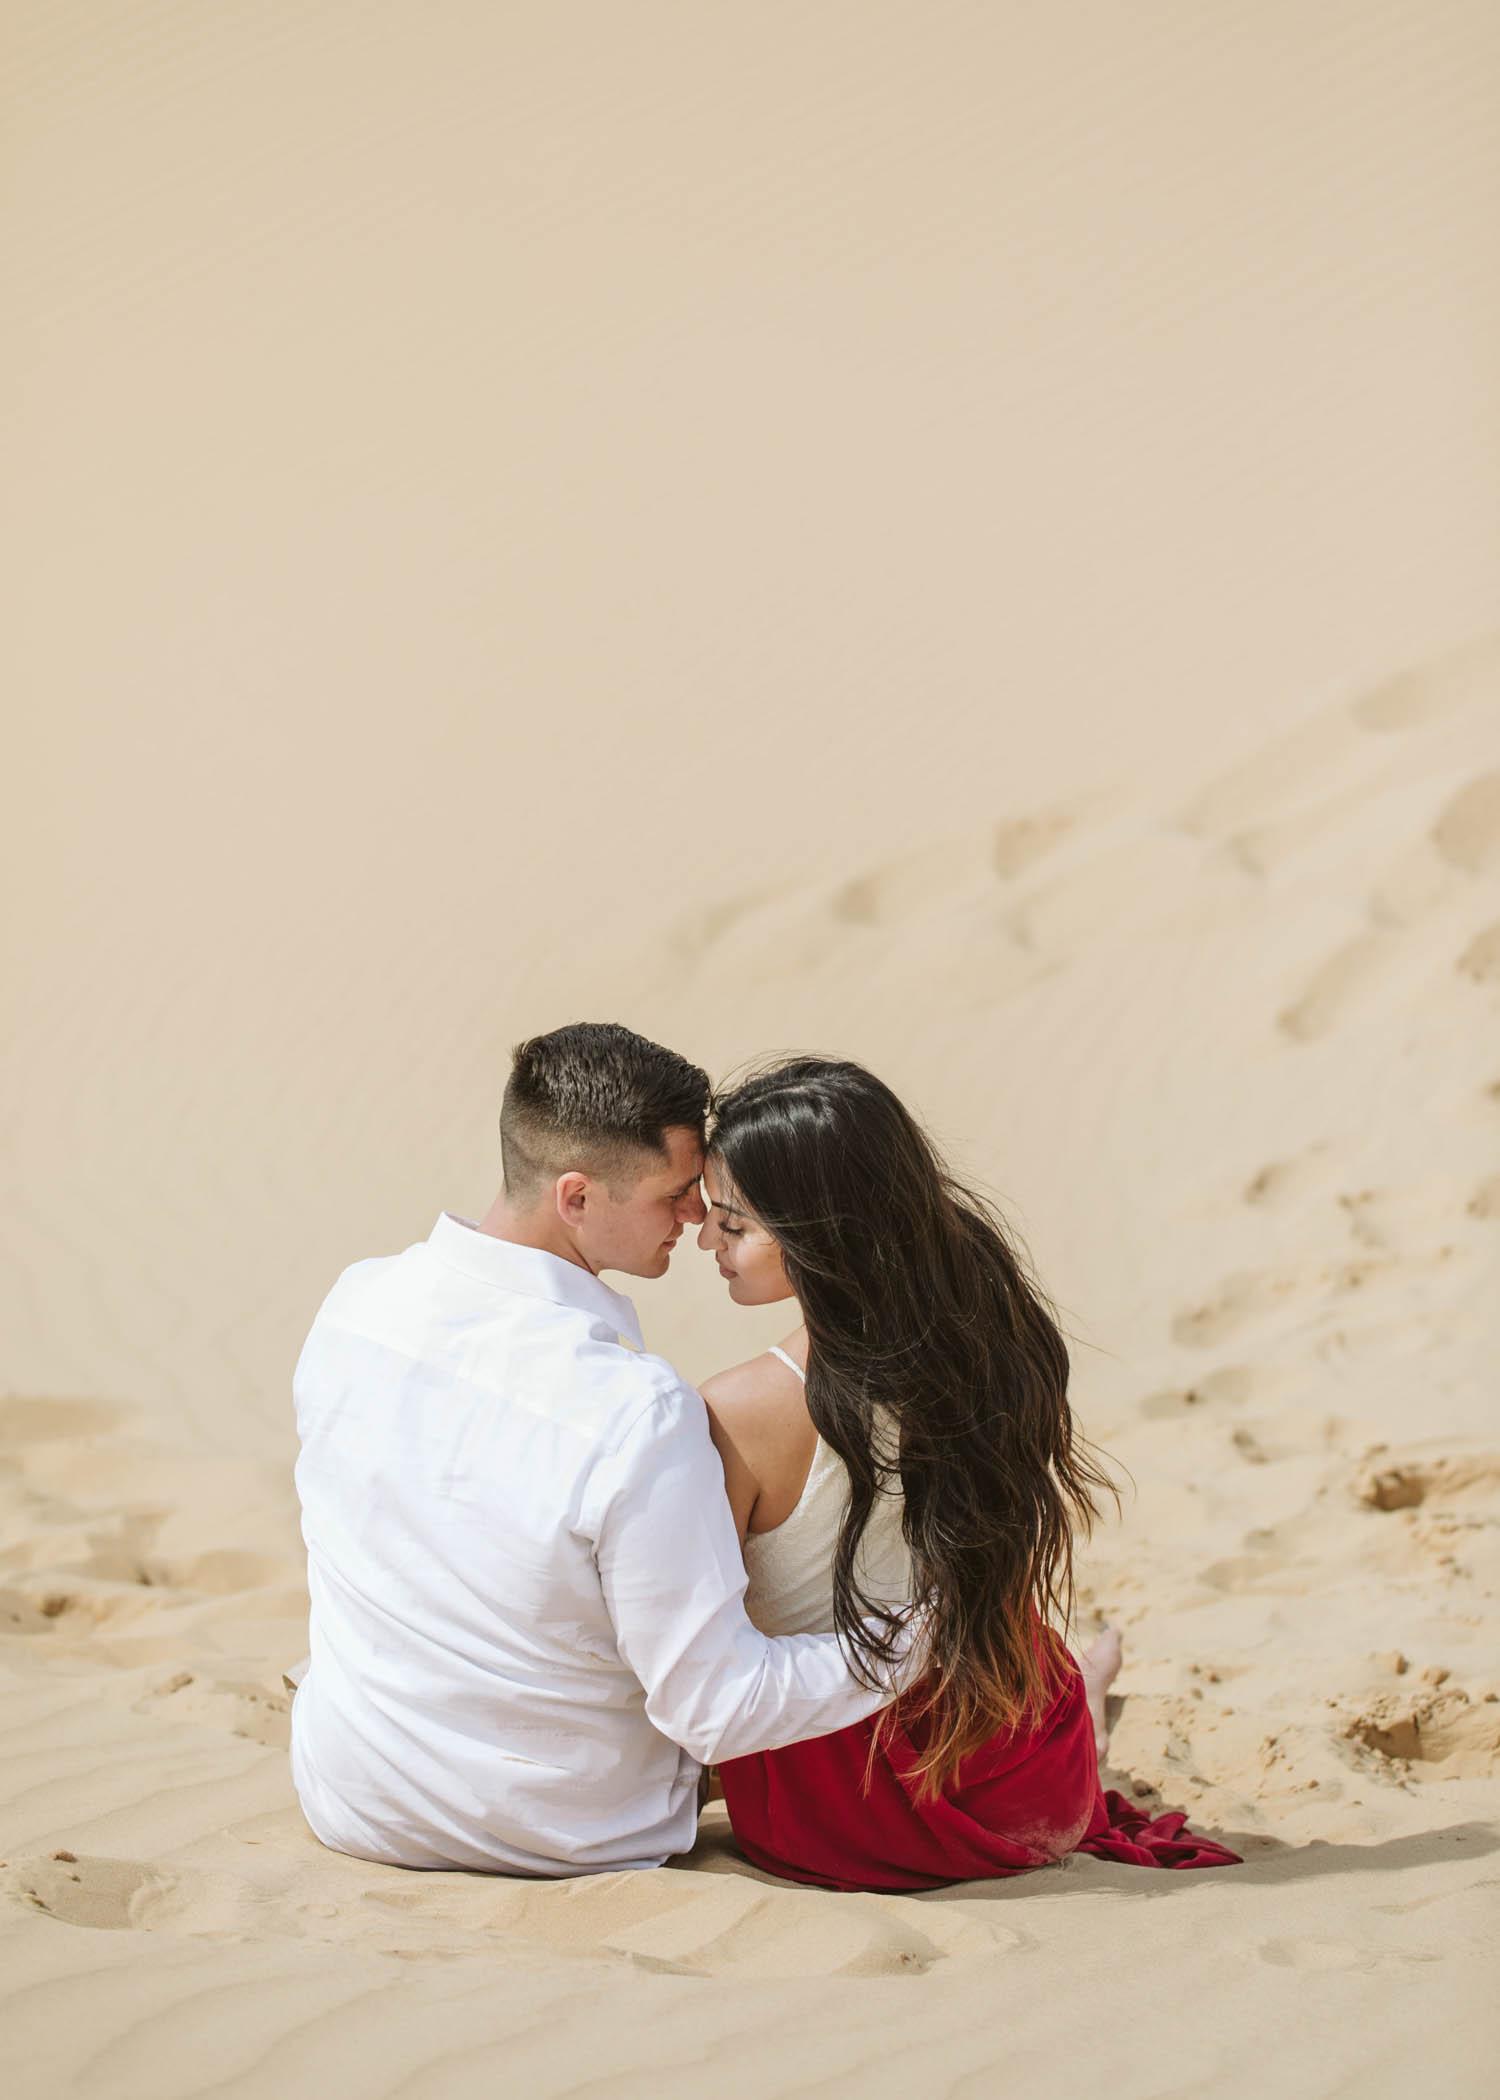 glamis_sand_dunes_couples_session_025.jpg